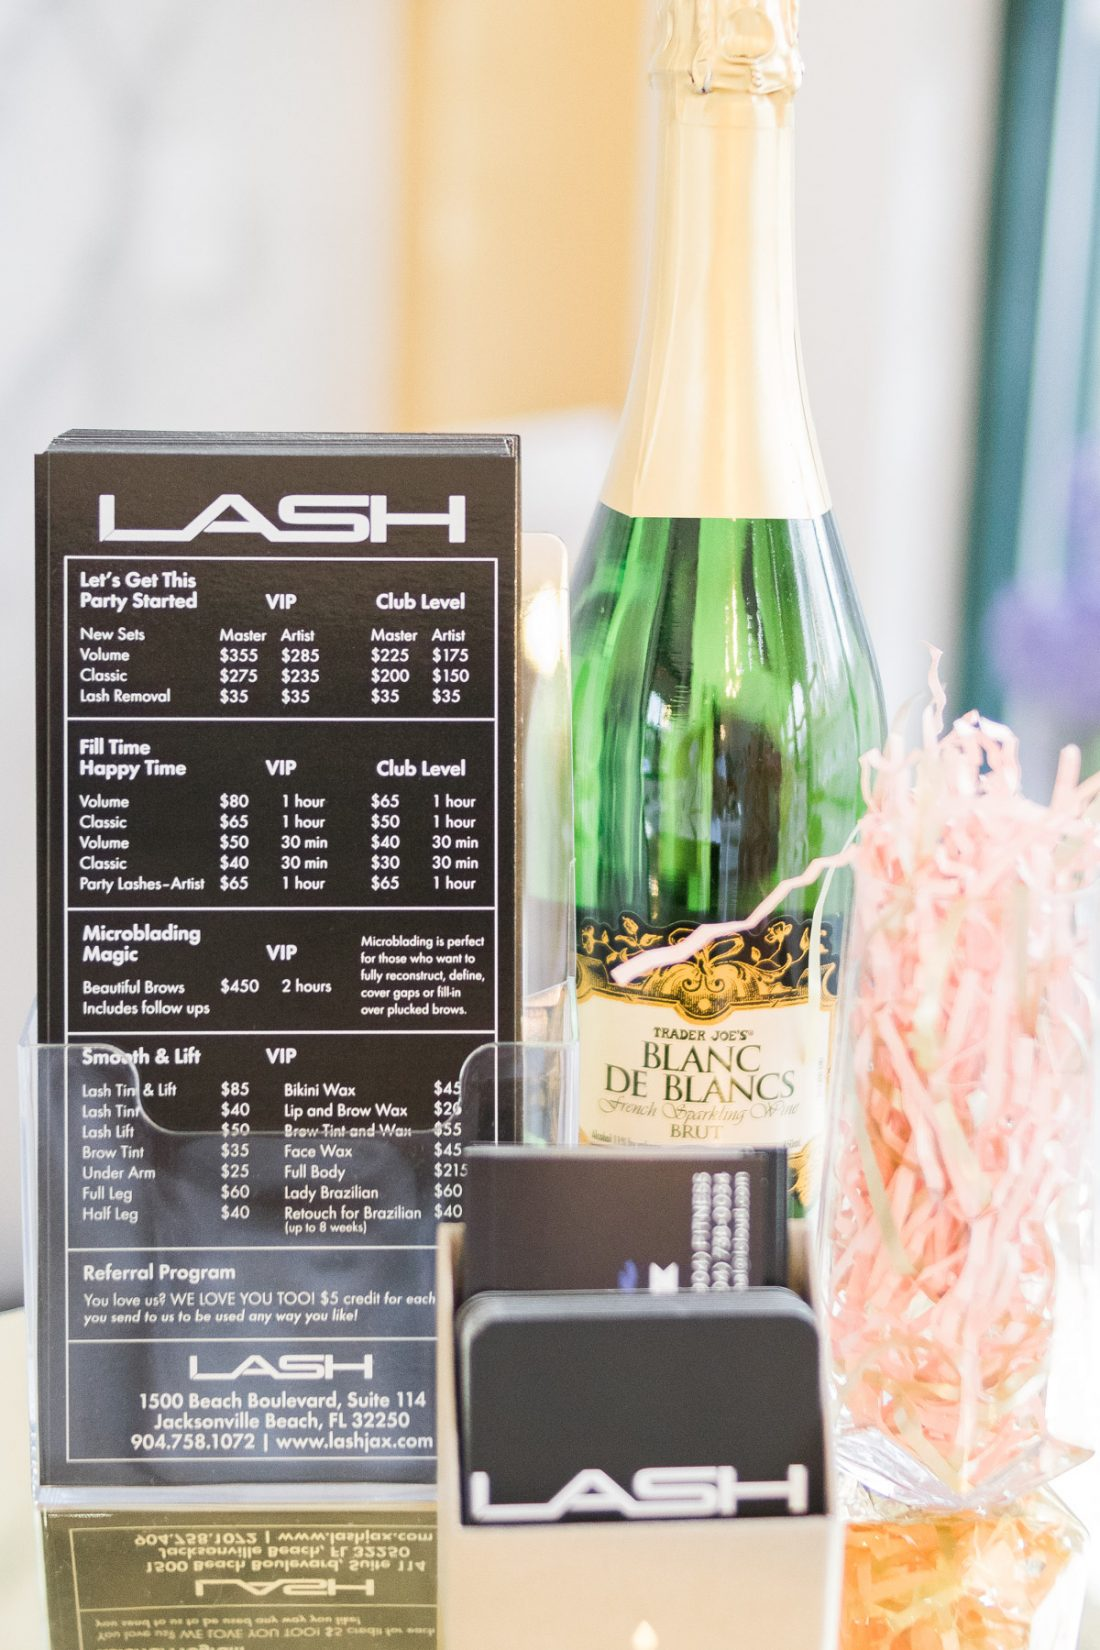 LASH Jax rate sheet next to champagne